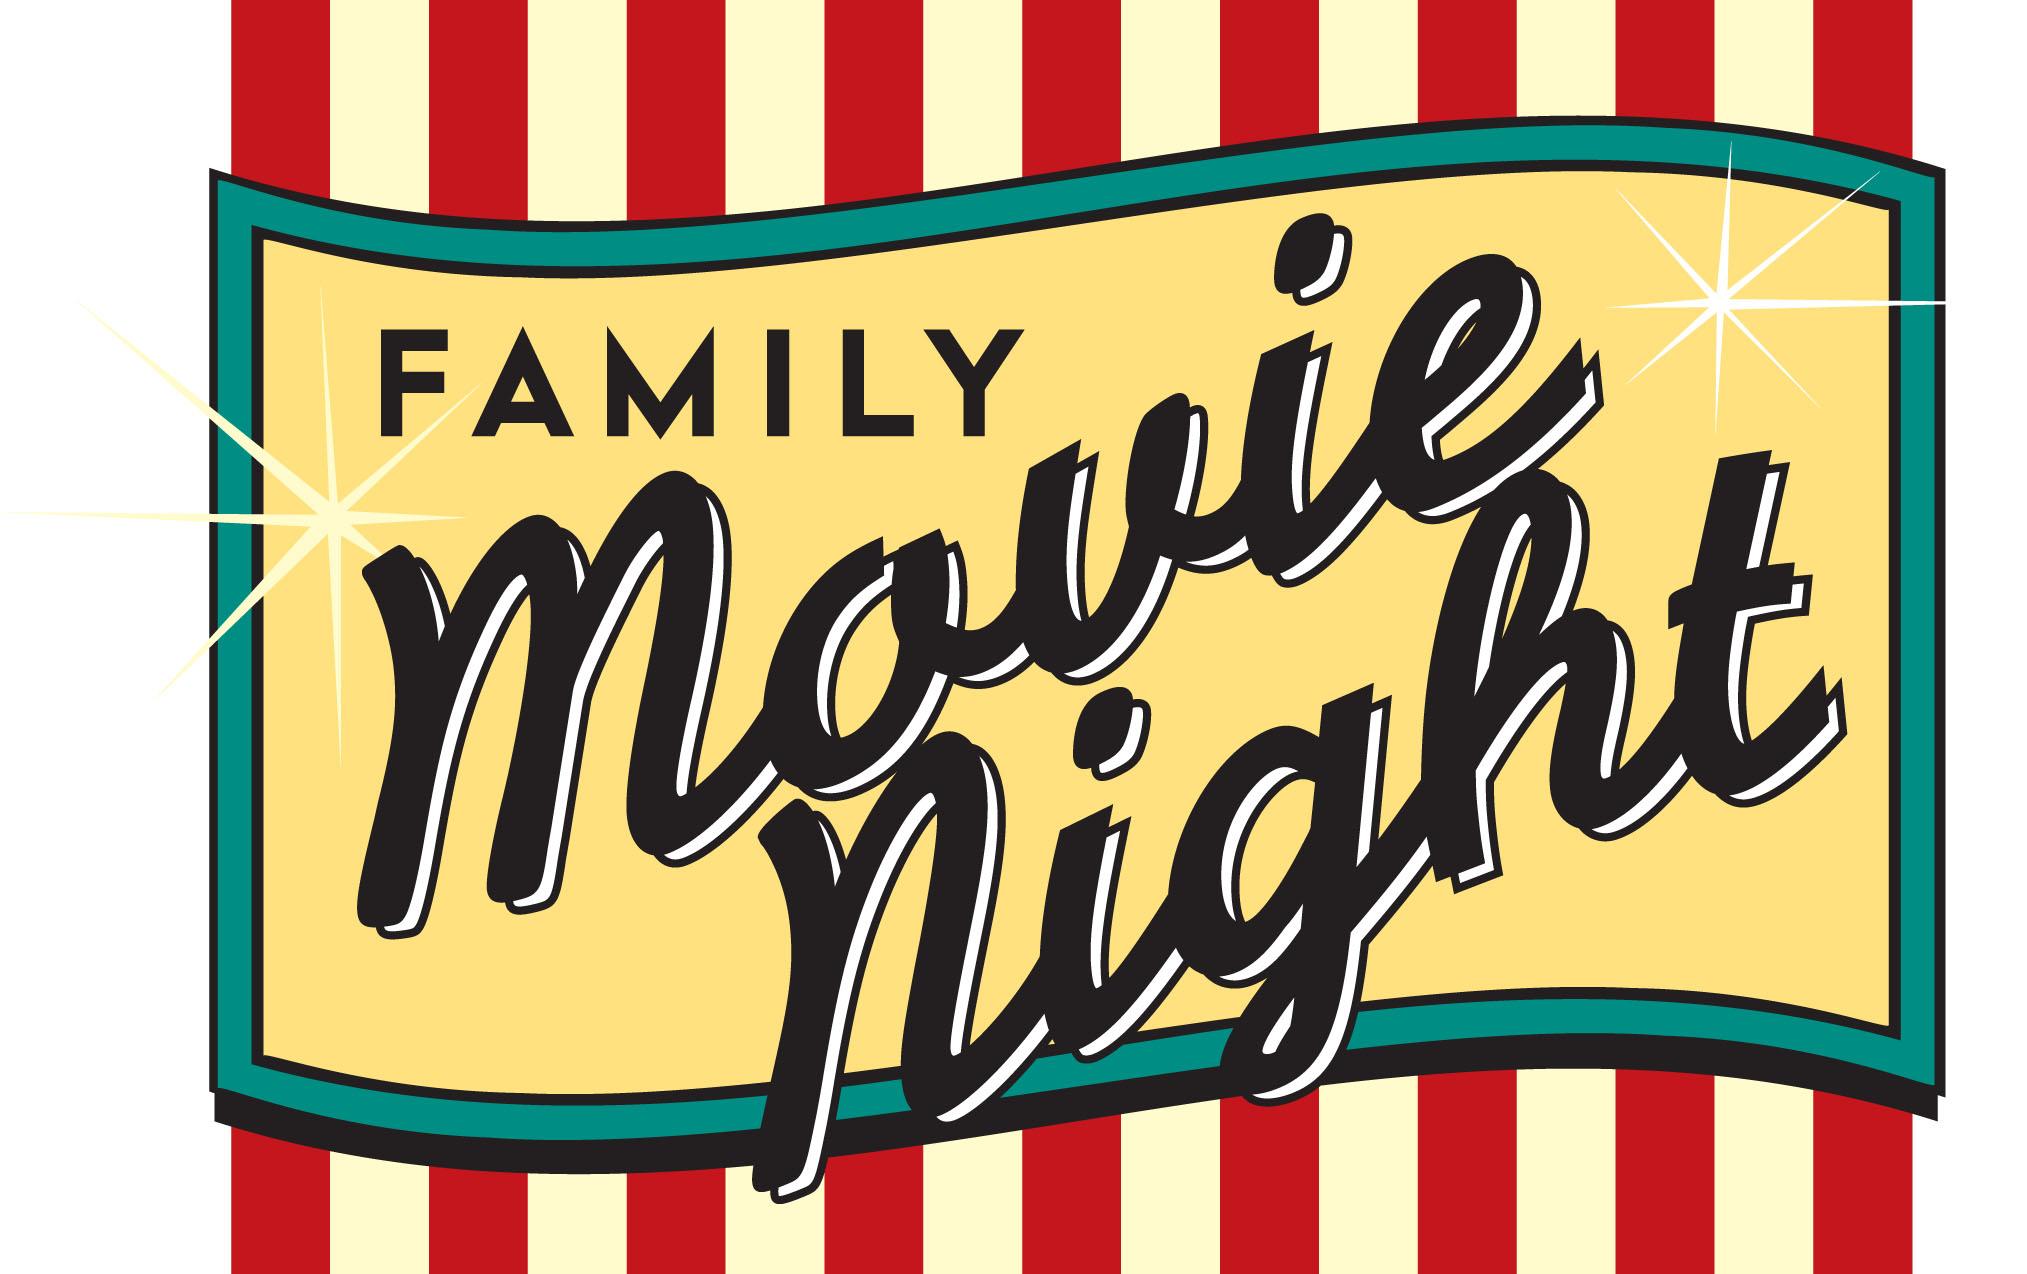 Movie night clipart 4